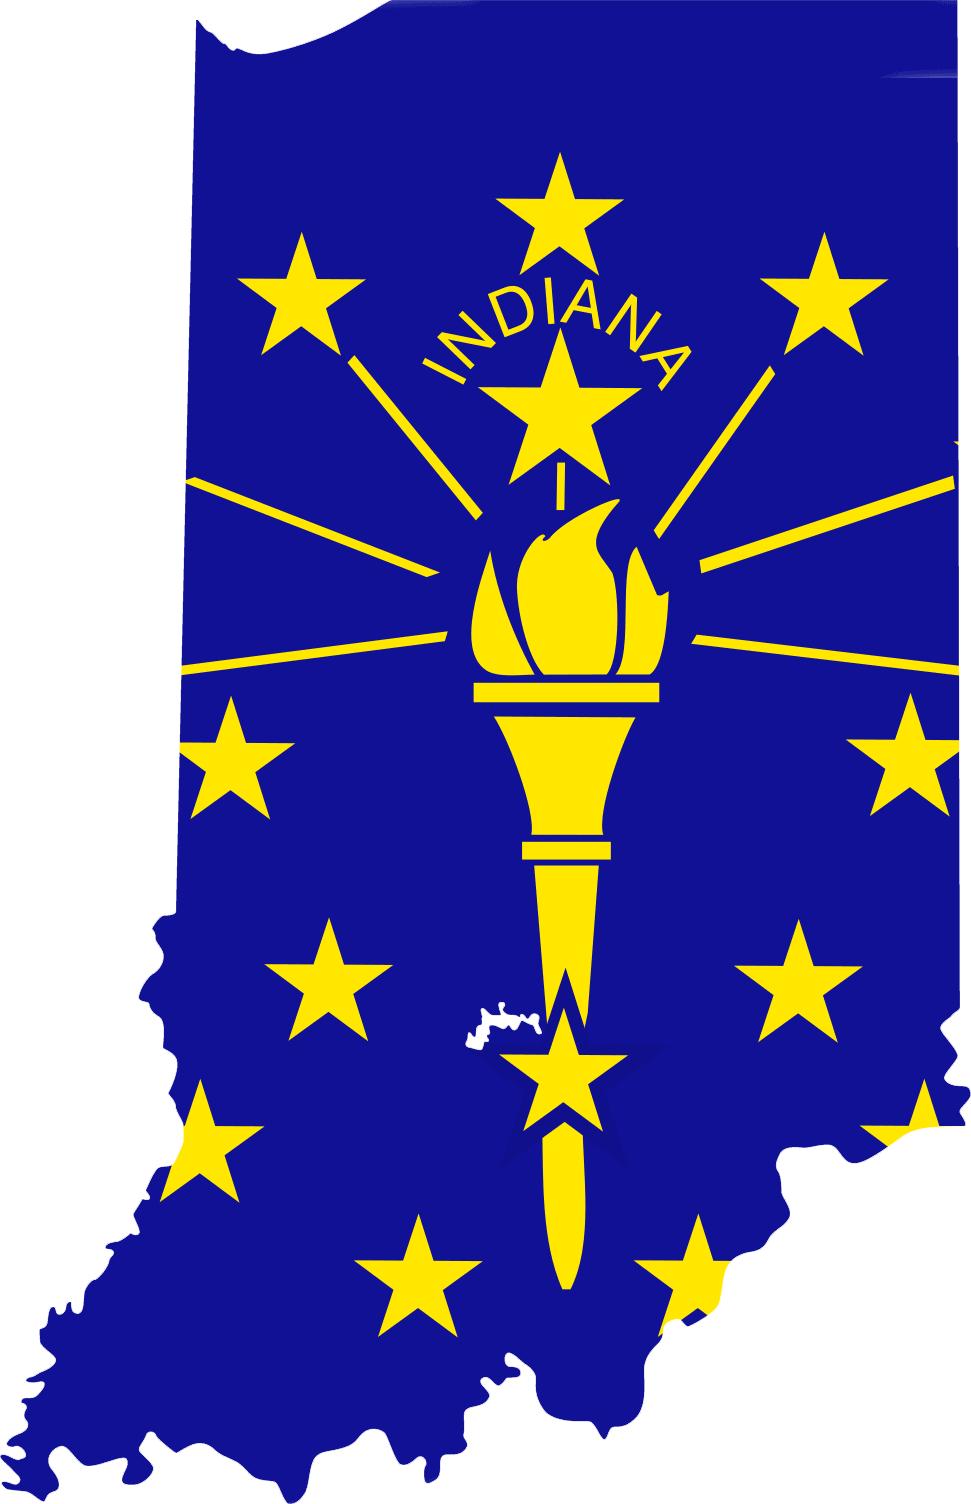 https://4.bp.blogspot.com/-5yCfYhmTDRw/VhIeaMRnVFI/AAAAAAAABLI/w9D4TAuknd0OBElqRsVvLINnyVt3GKxFA/s1600/Indiana.png